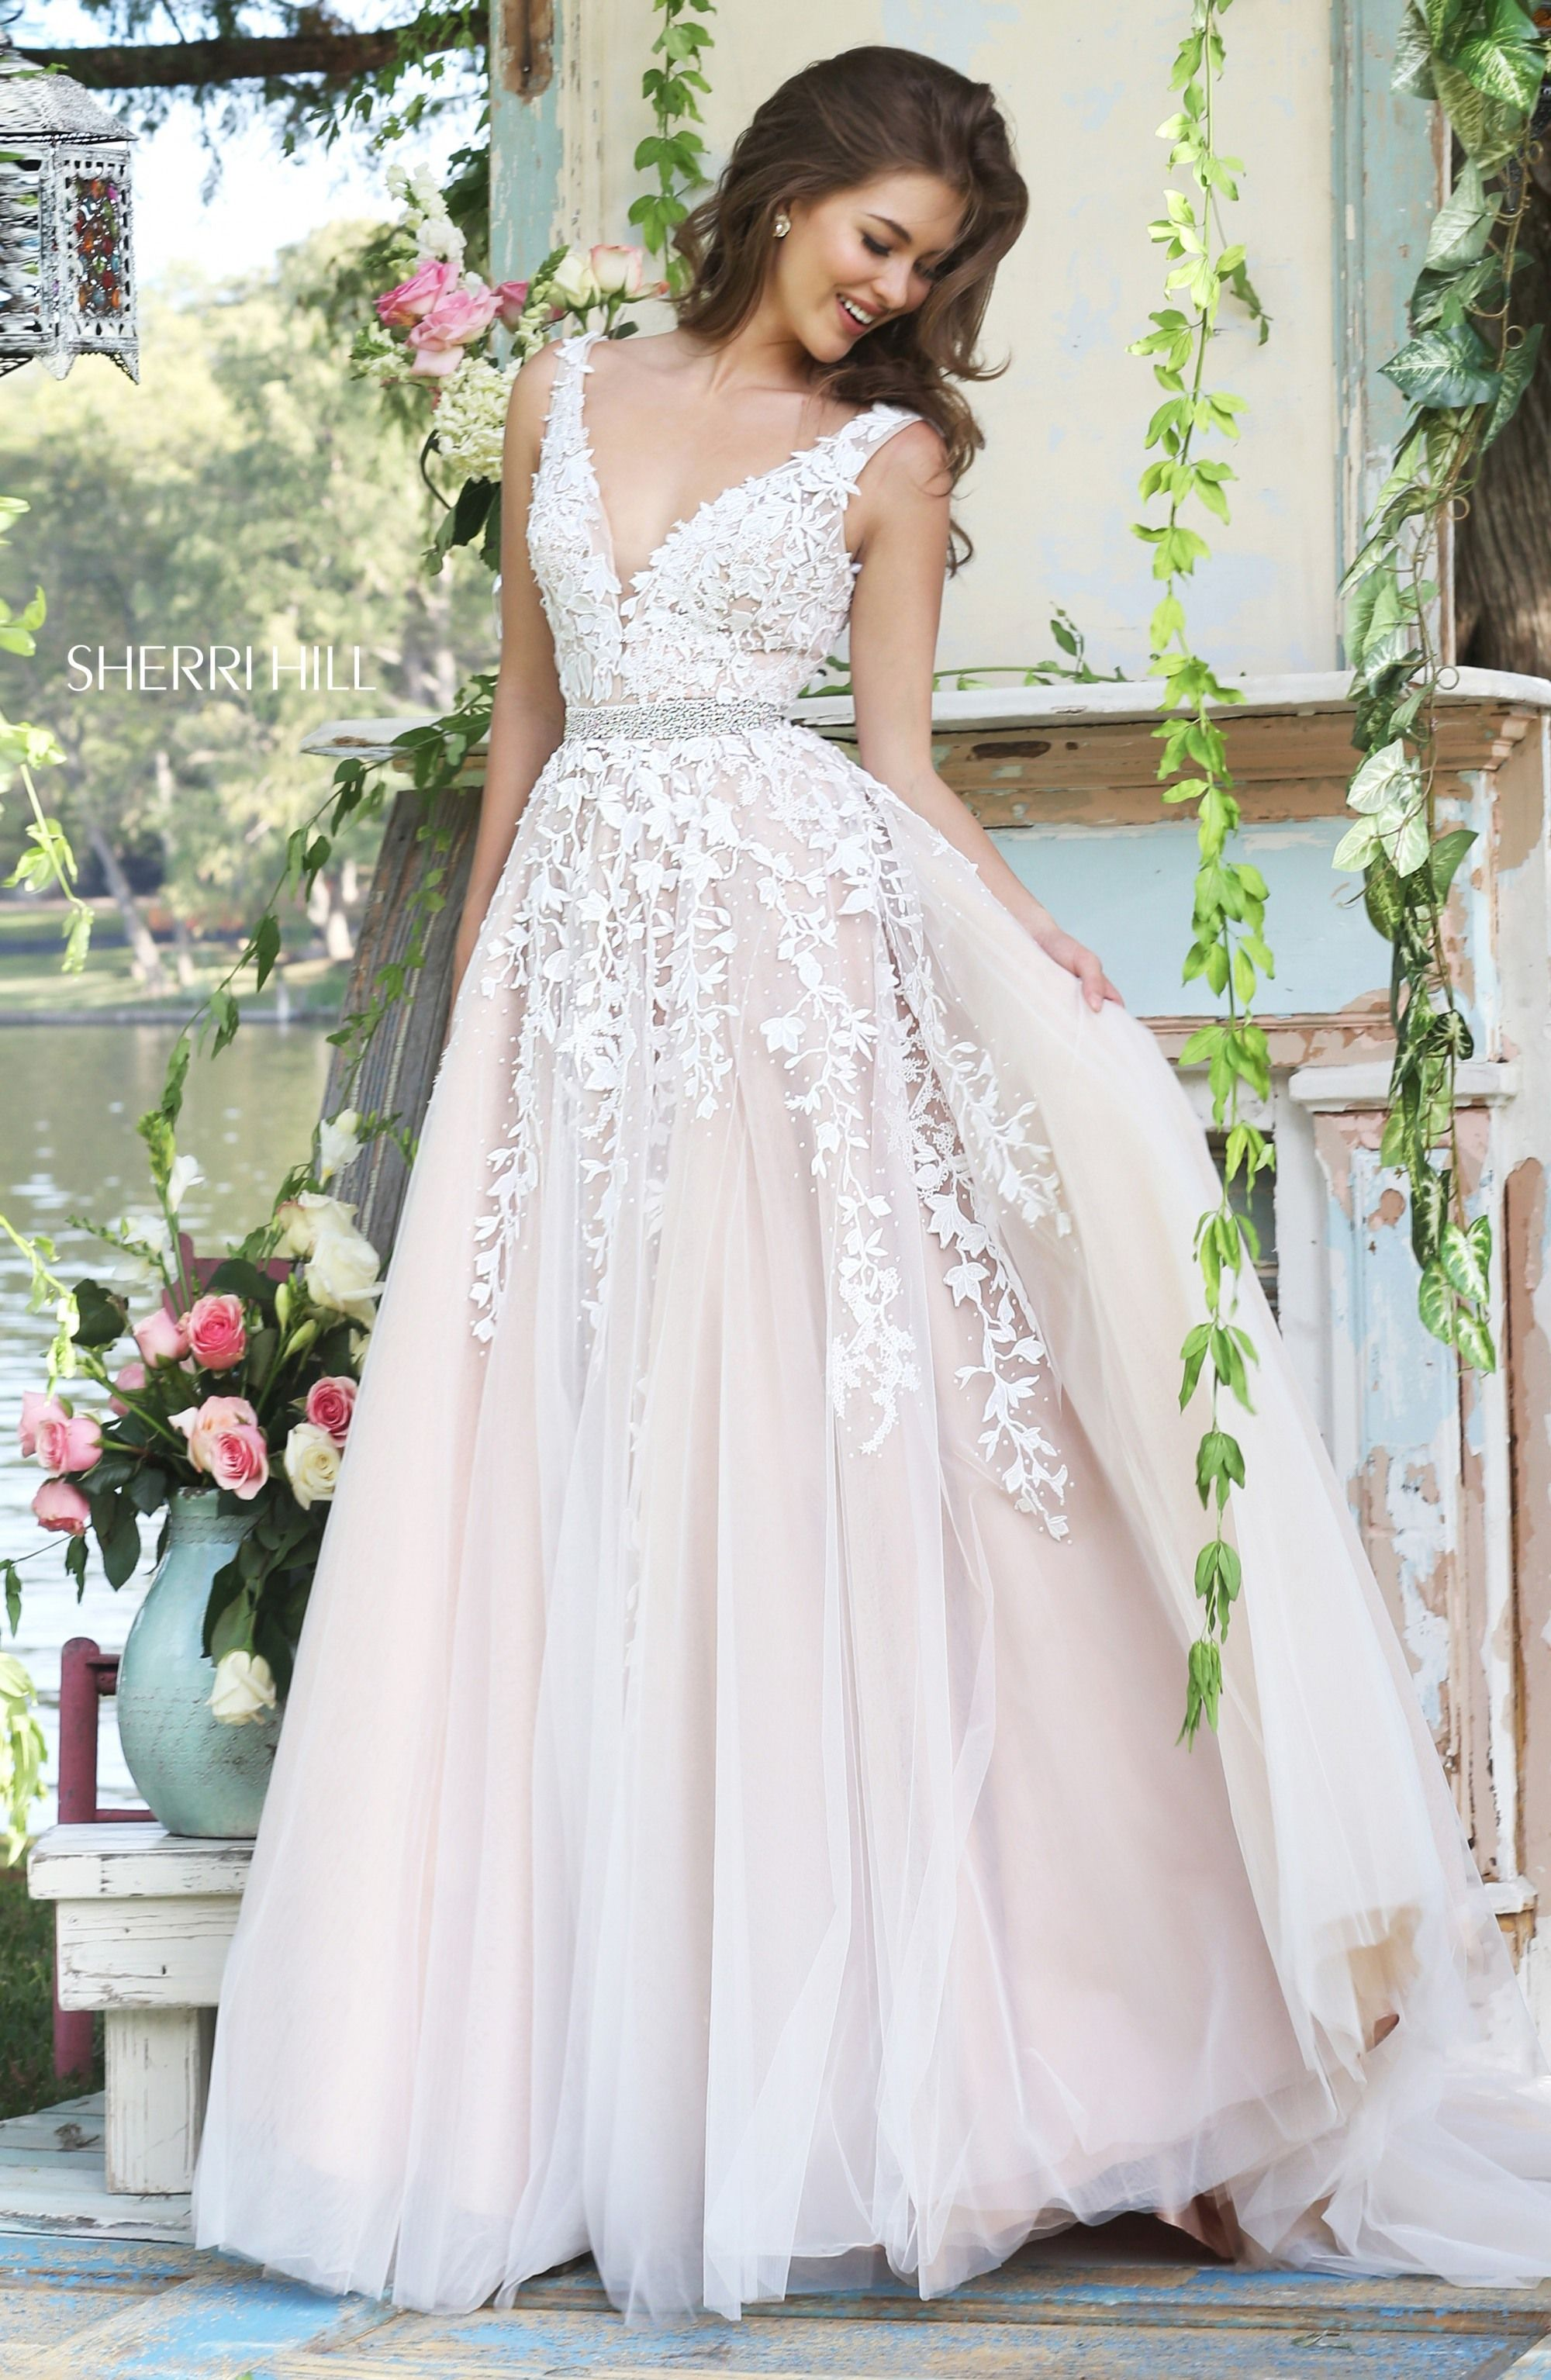 Sherri hill lace wedding dress  This Sherri Hill  Prom Dress features a beautiful ALine